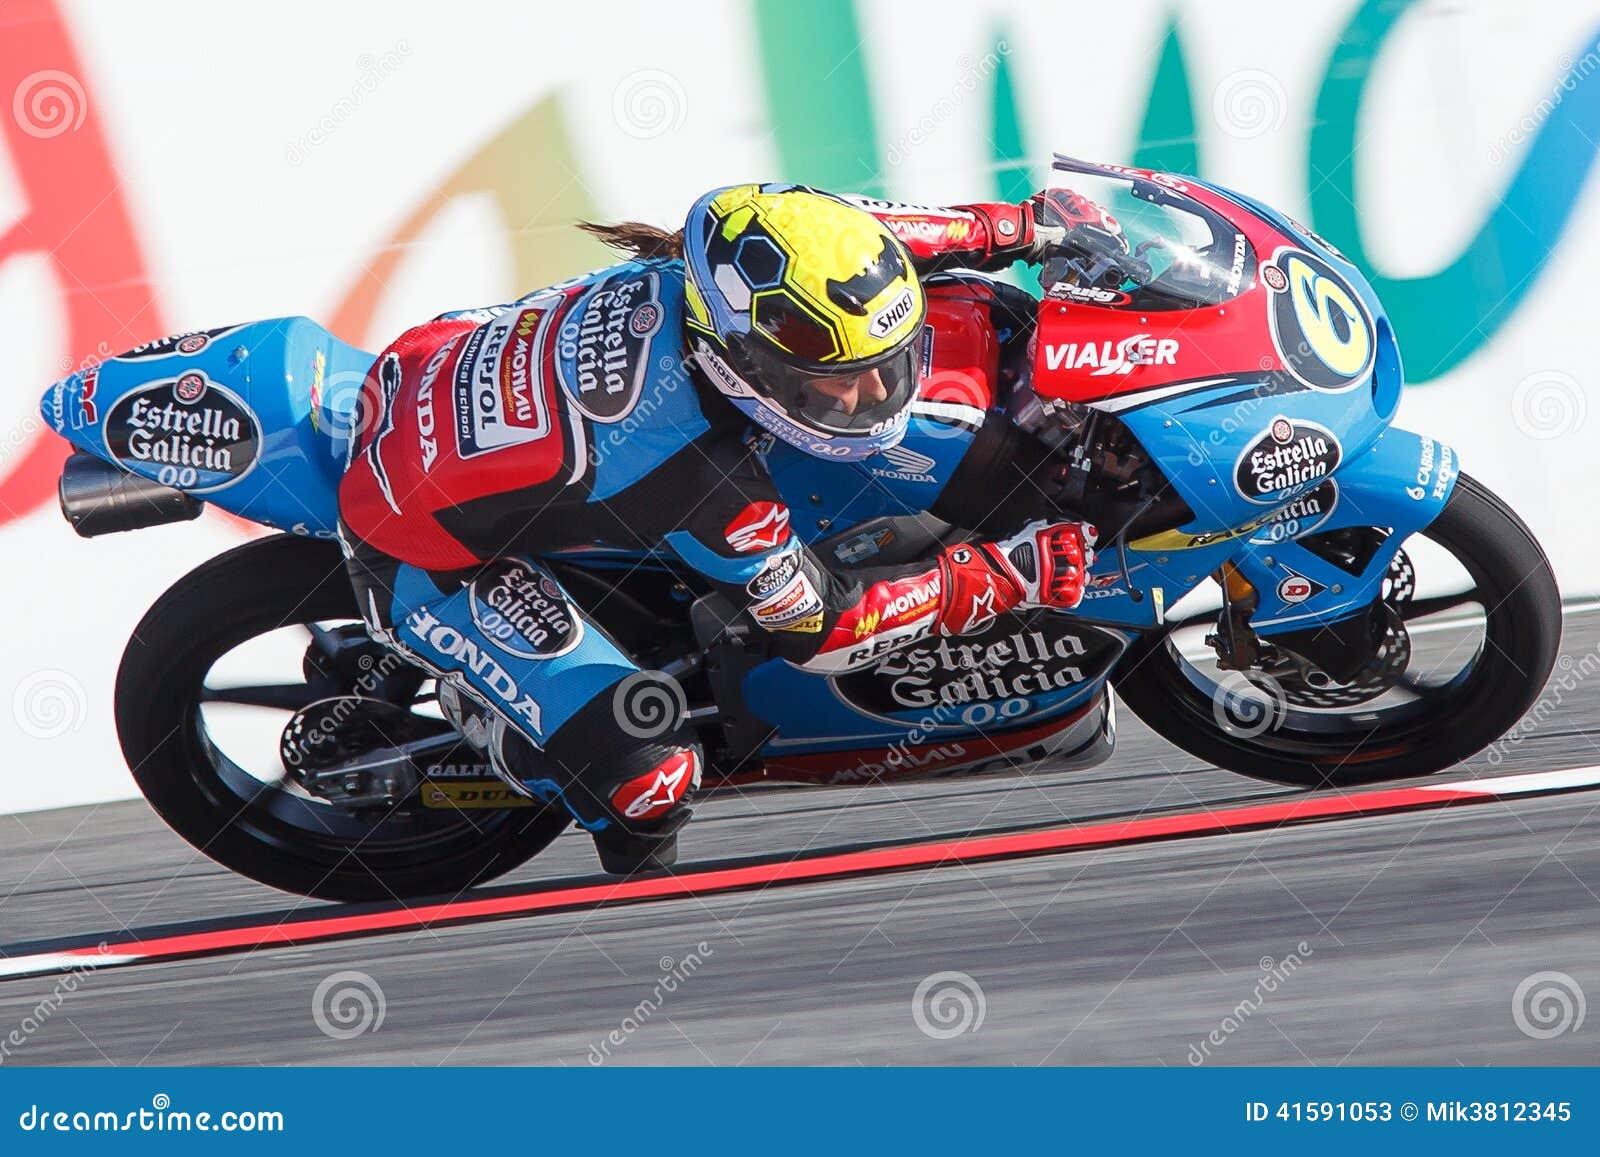 Monster Energy Grand Prix Of Catalunya MotoGP. Driver Maria Herrera. Estrella Galicia Team ...